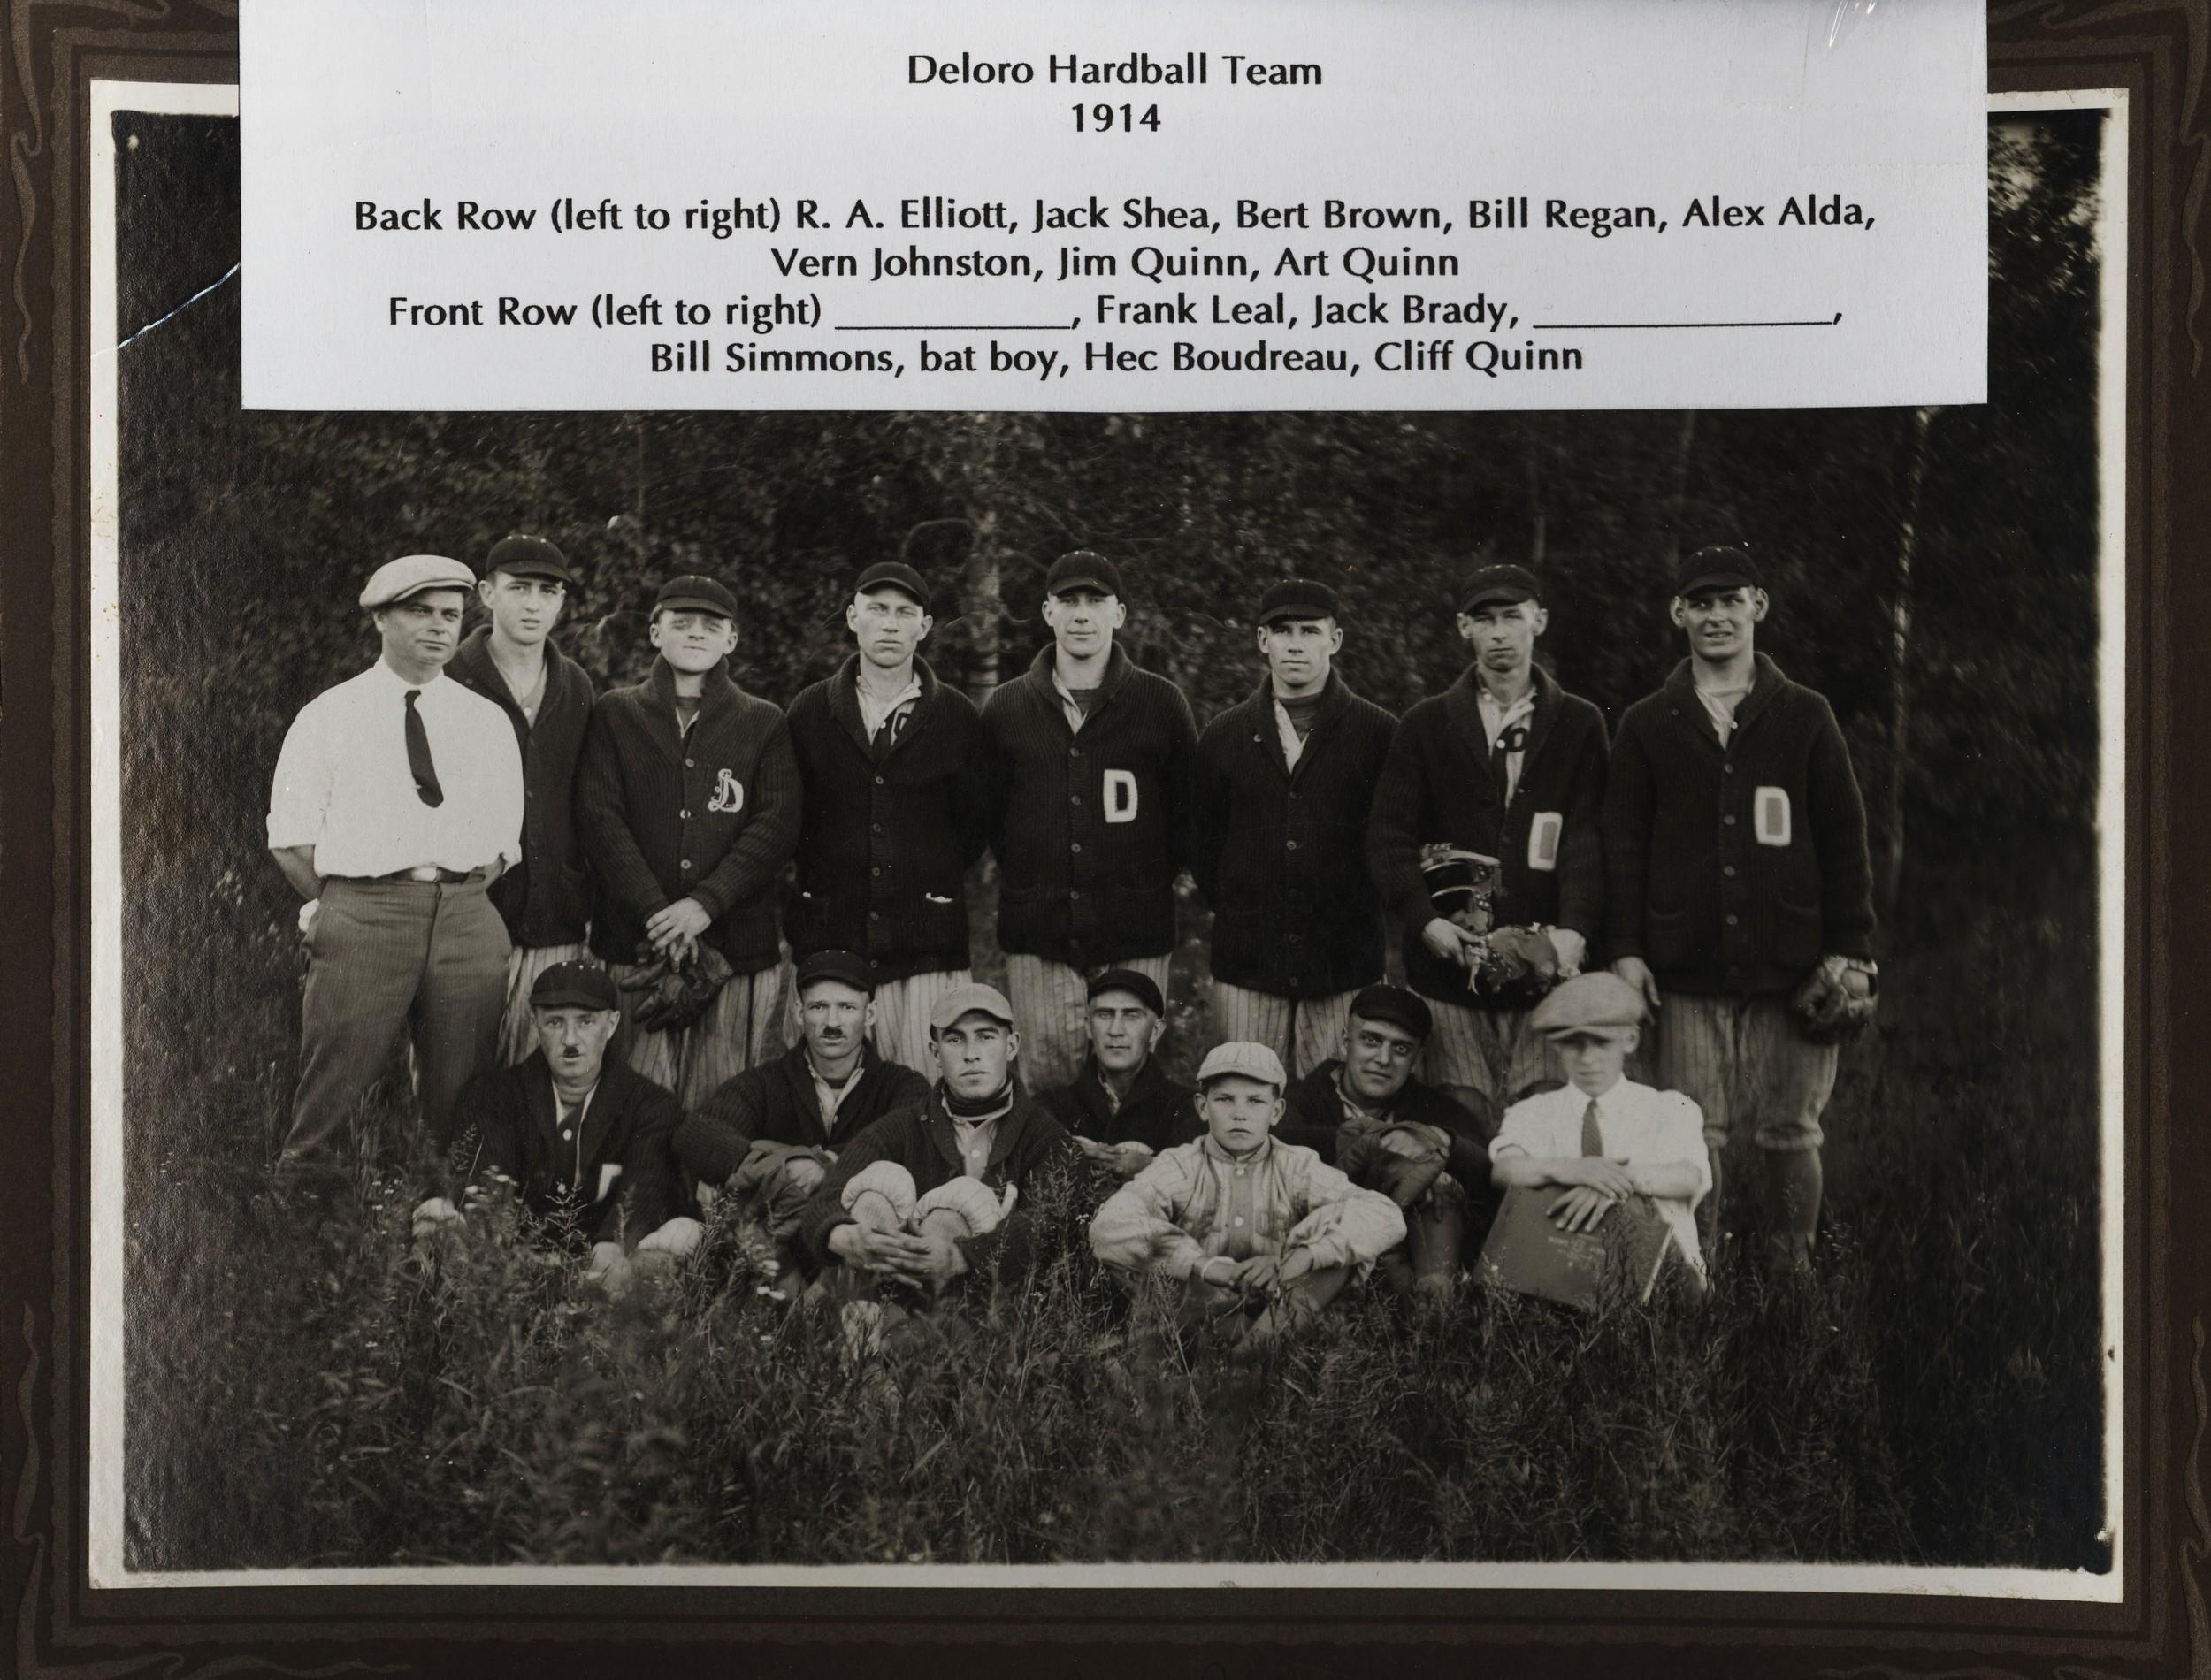 Deloro Hardball Team1914